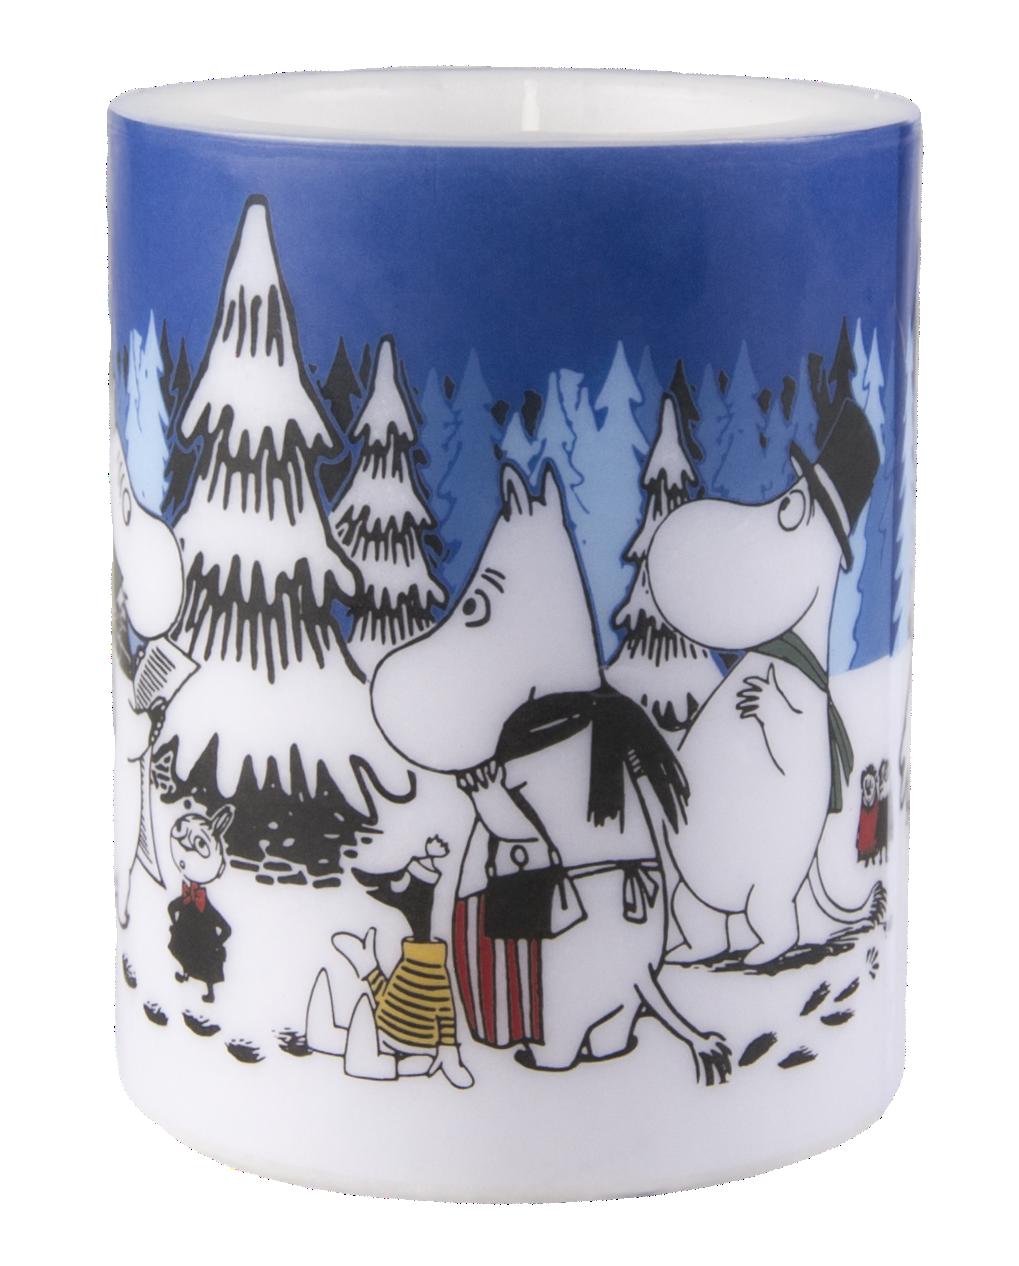 Muurla Moomin Winter Forest 12cm